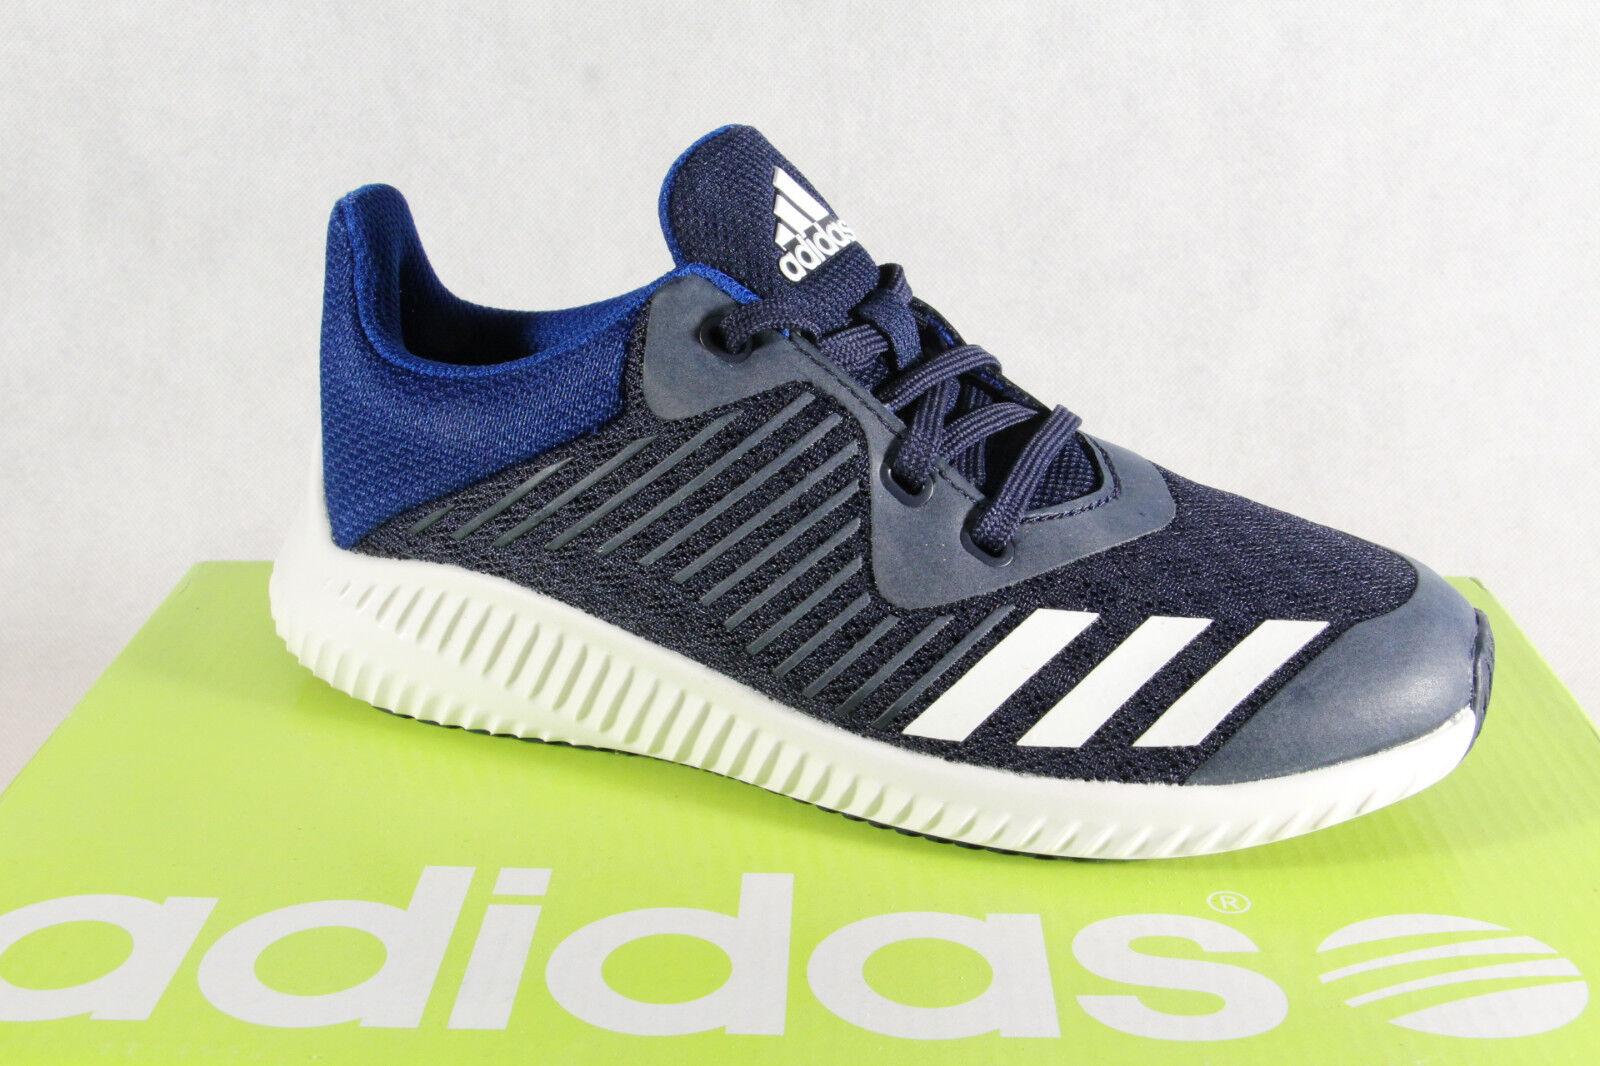 Adidas Sportschuhe Laufschuhe Hallenschuh FortaRun blau weiß NEU!